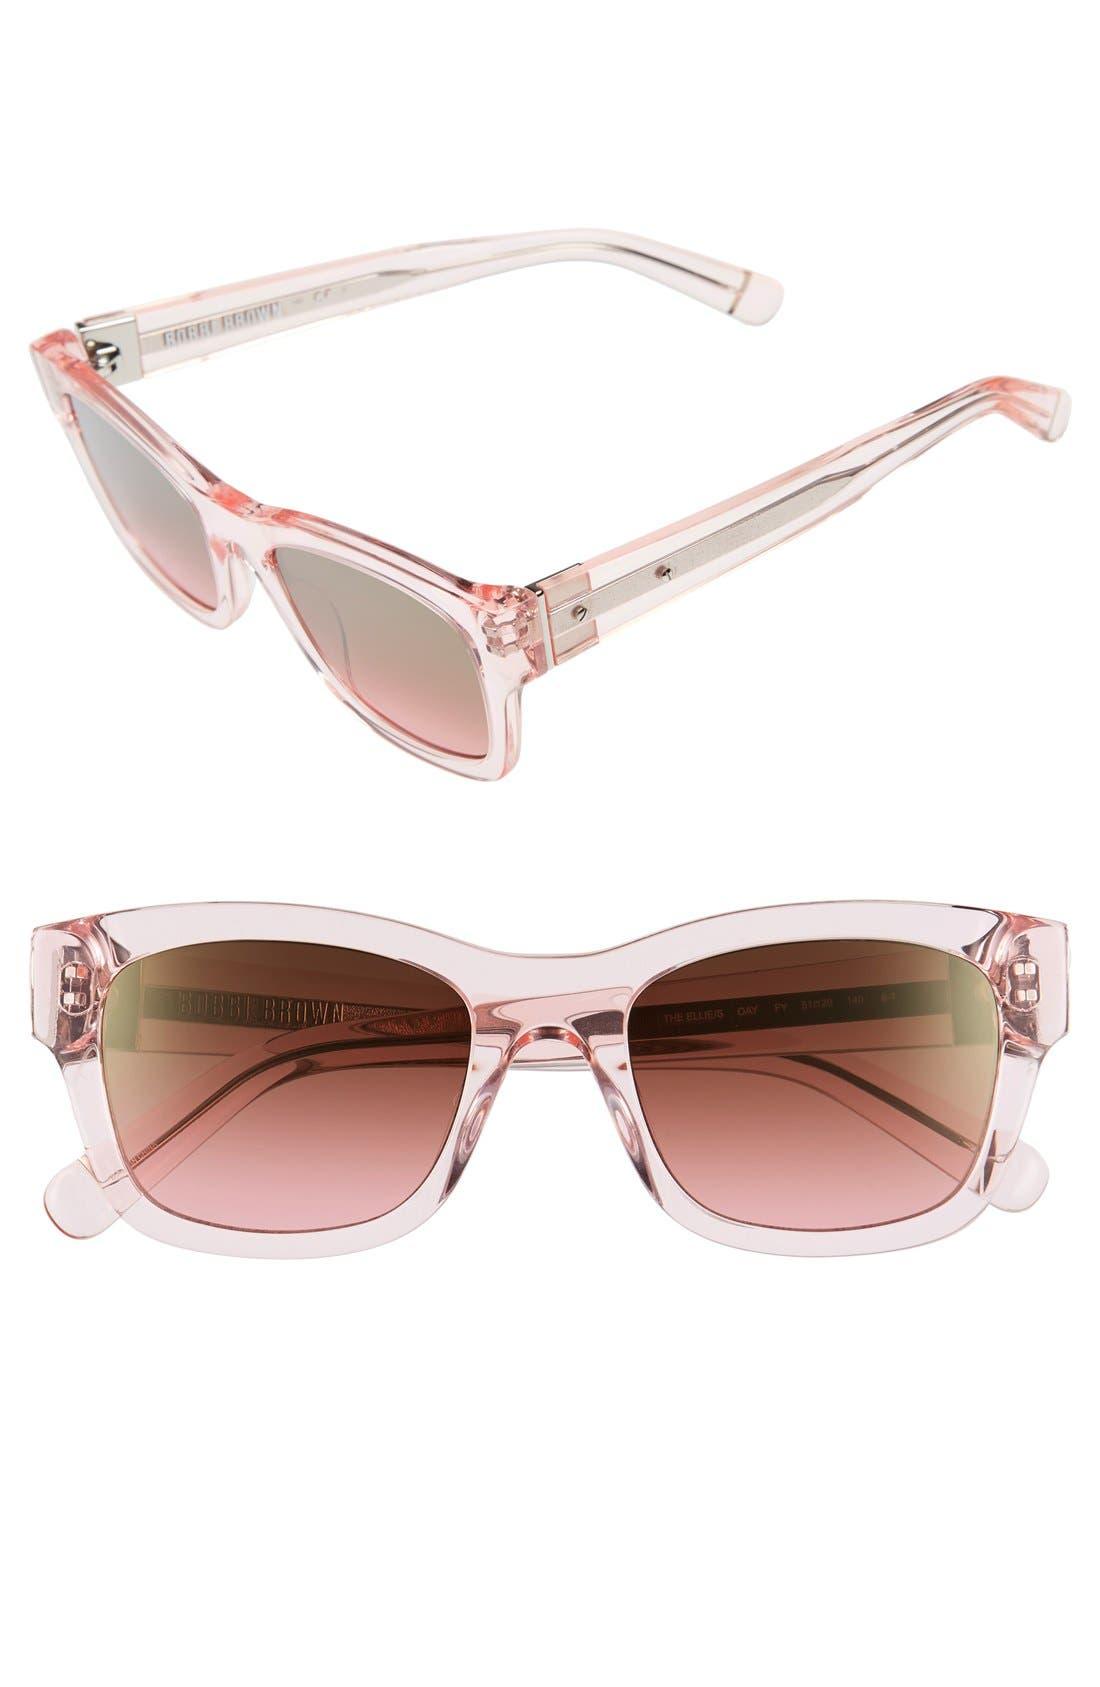 Alternate Image 1 Selected - Bobbi Brown 'The Ellie' 51mm Sunglasses